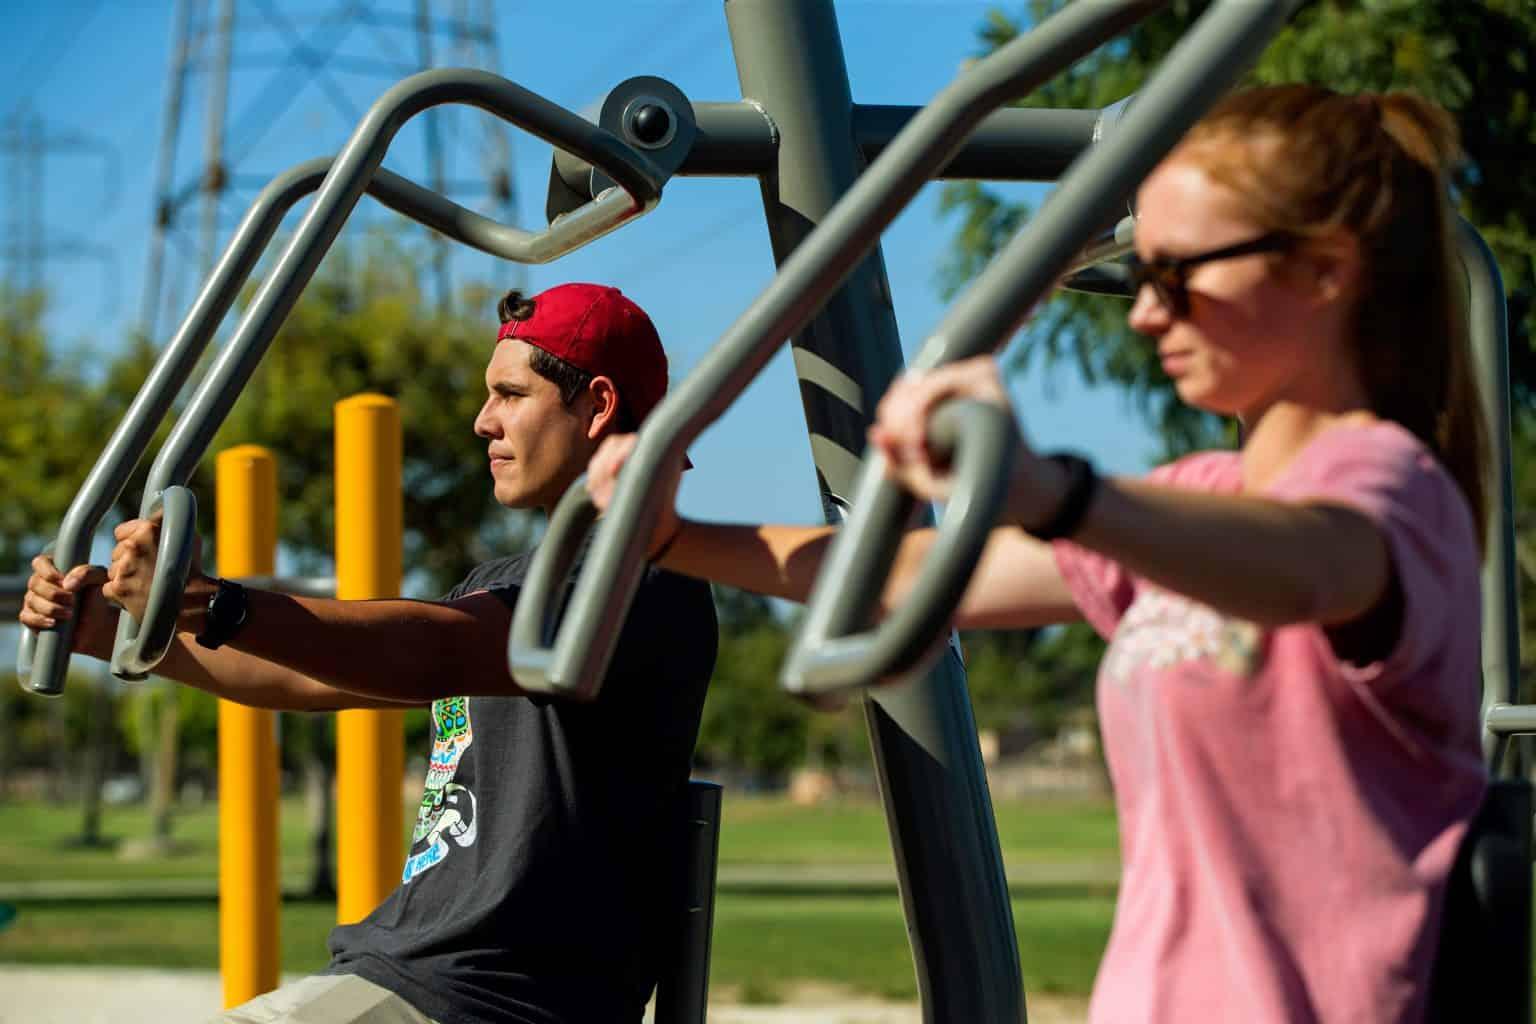 outdoor-fitness-equipment_49643267778_o-1536x1024